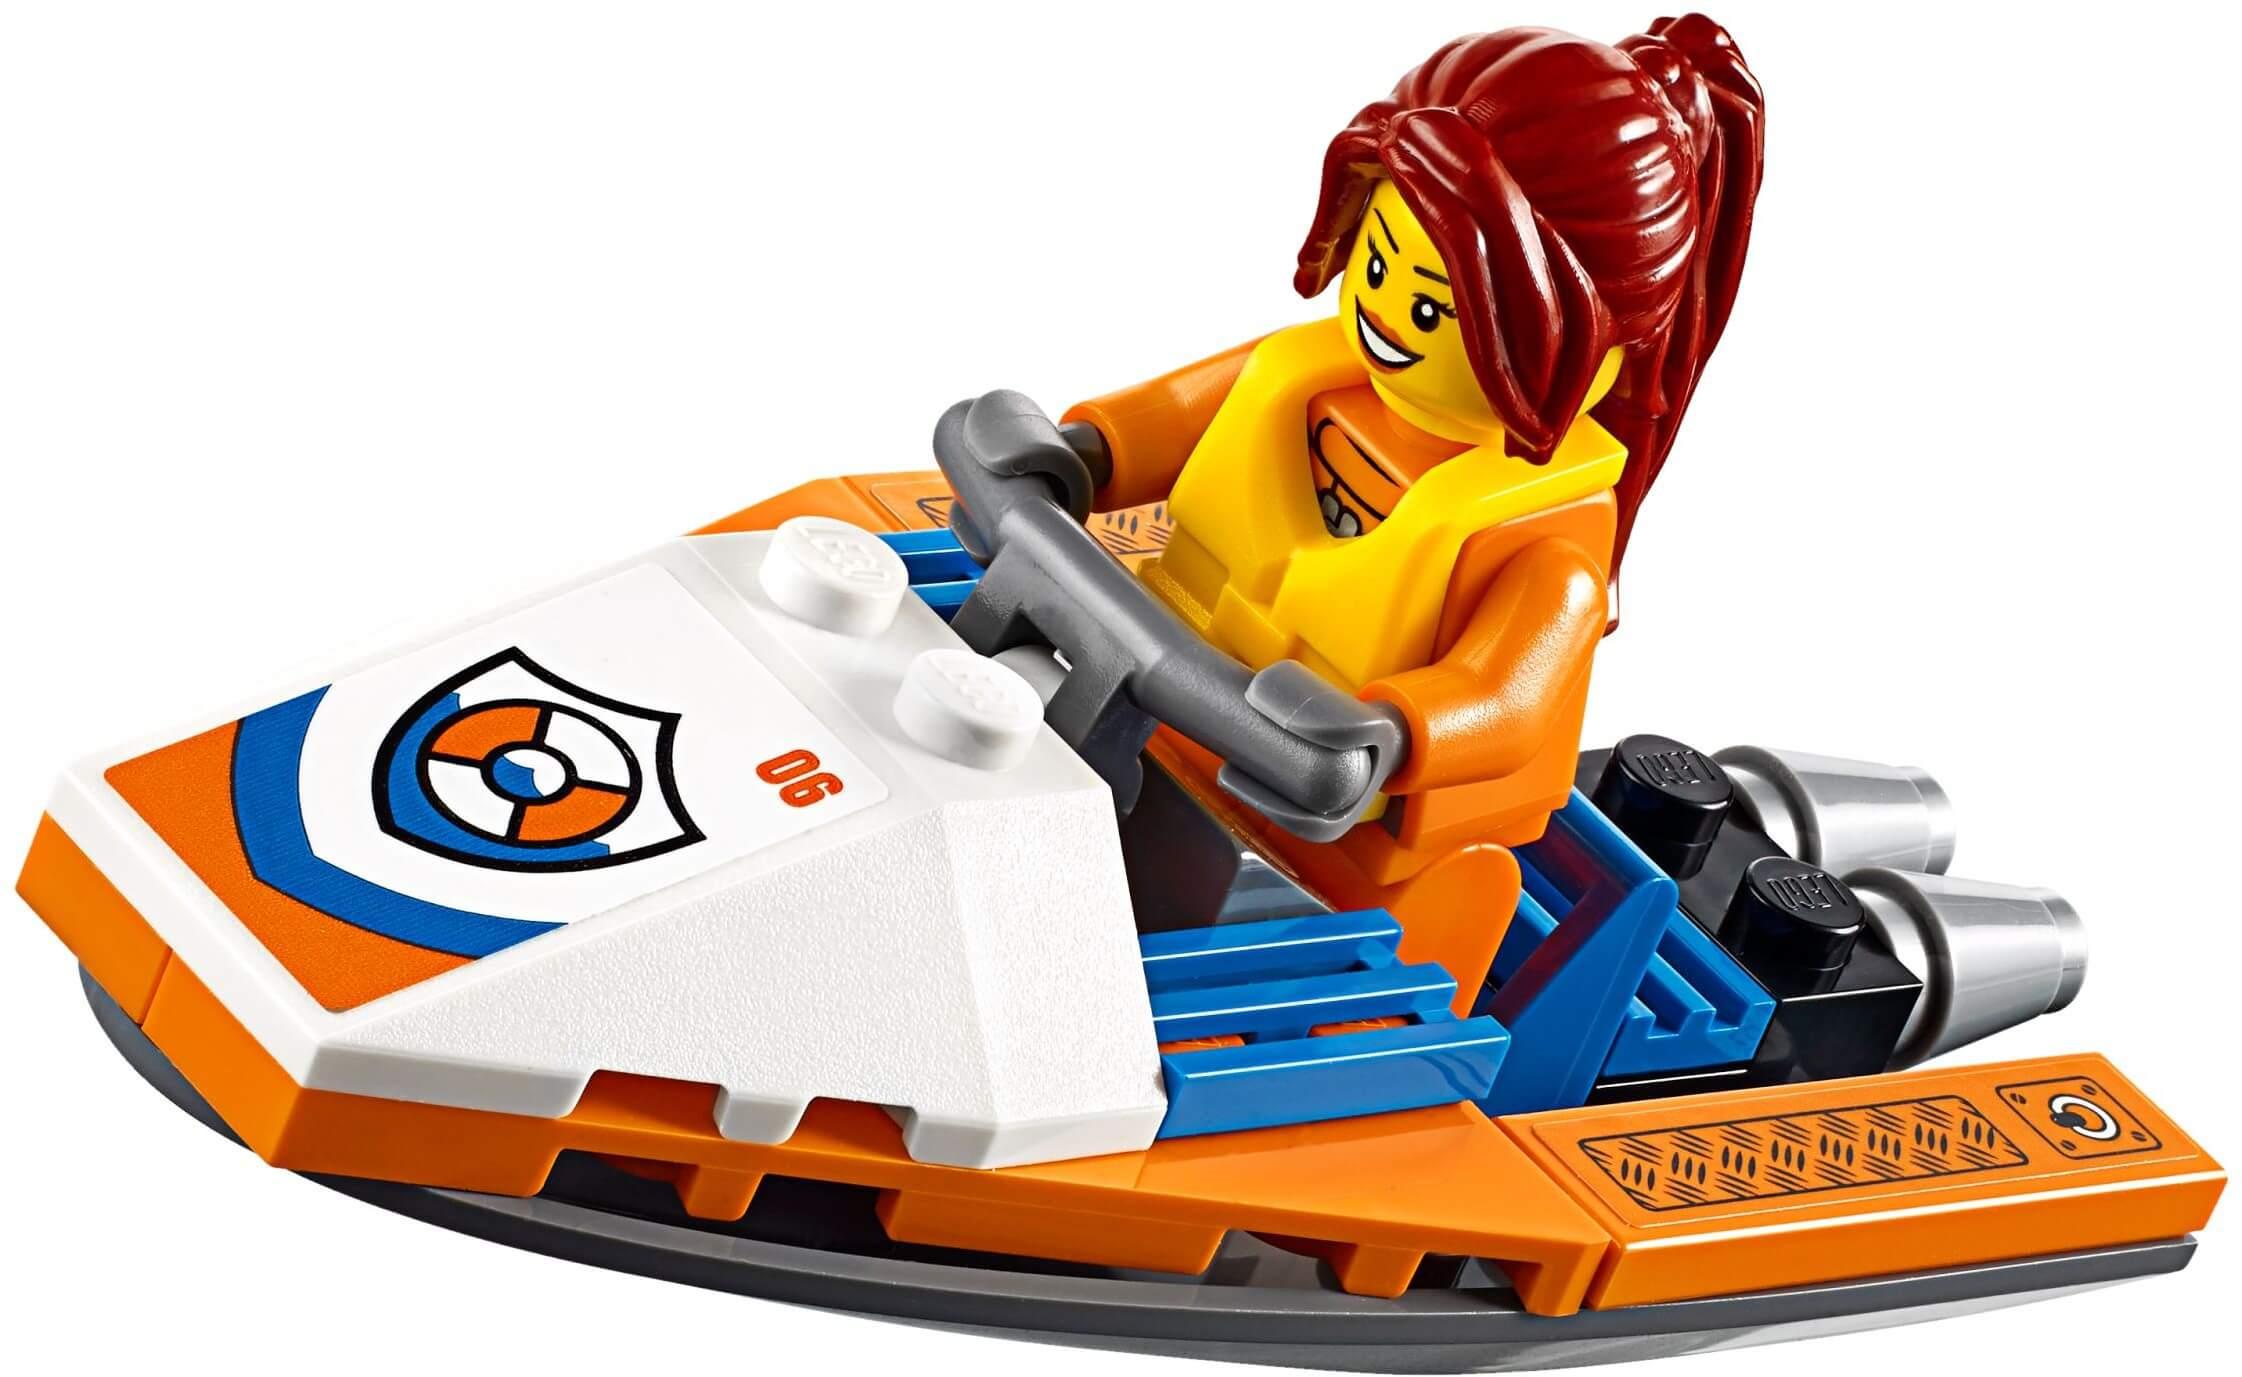 Mua đồ chơi LEGO 60166 - LEGO City 60166 - Trực Thăng Cứu Hộ Lớn (LEGO City Heavy-duty Rescue Helicopter)